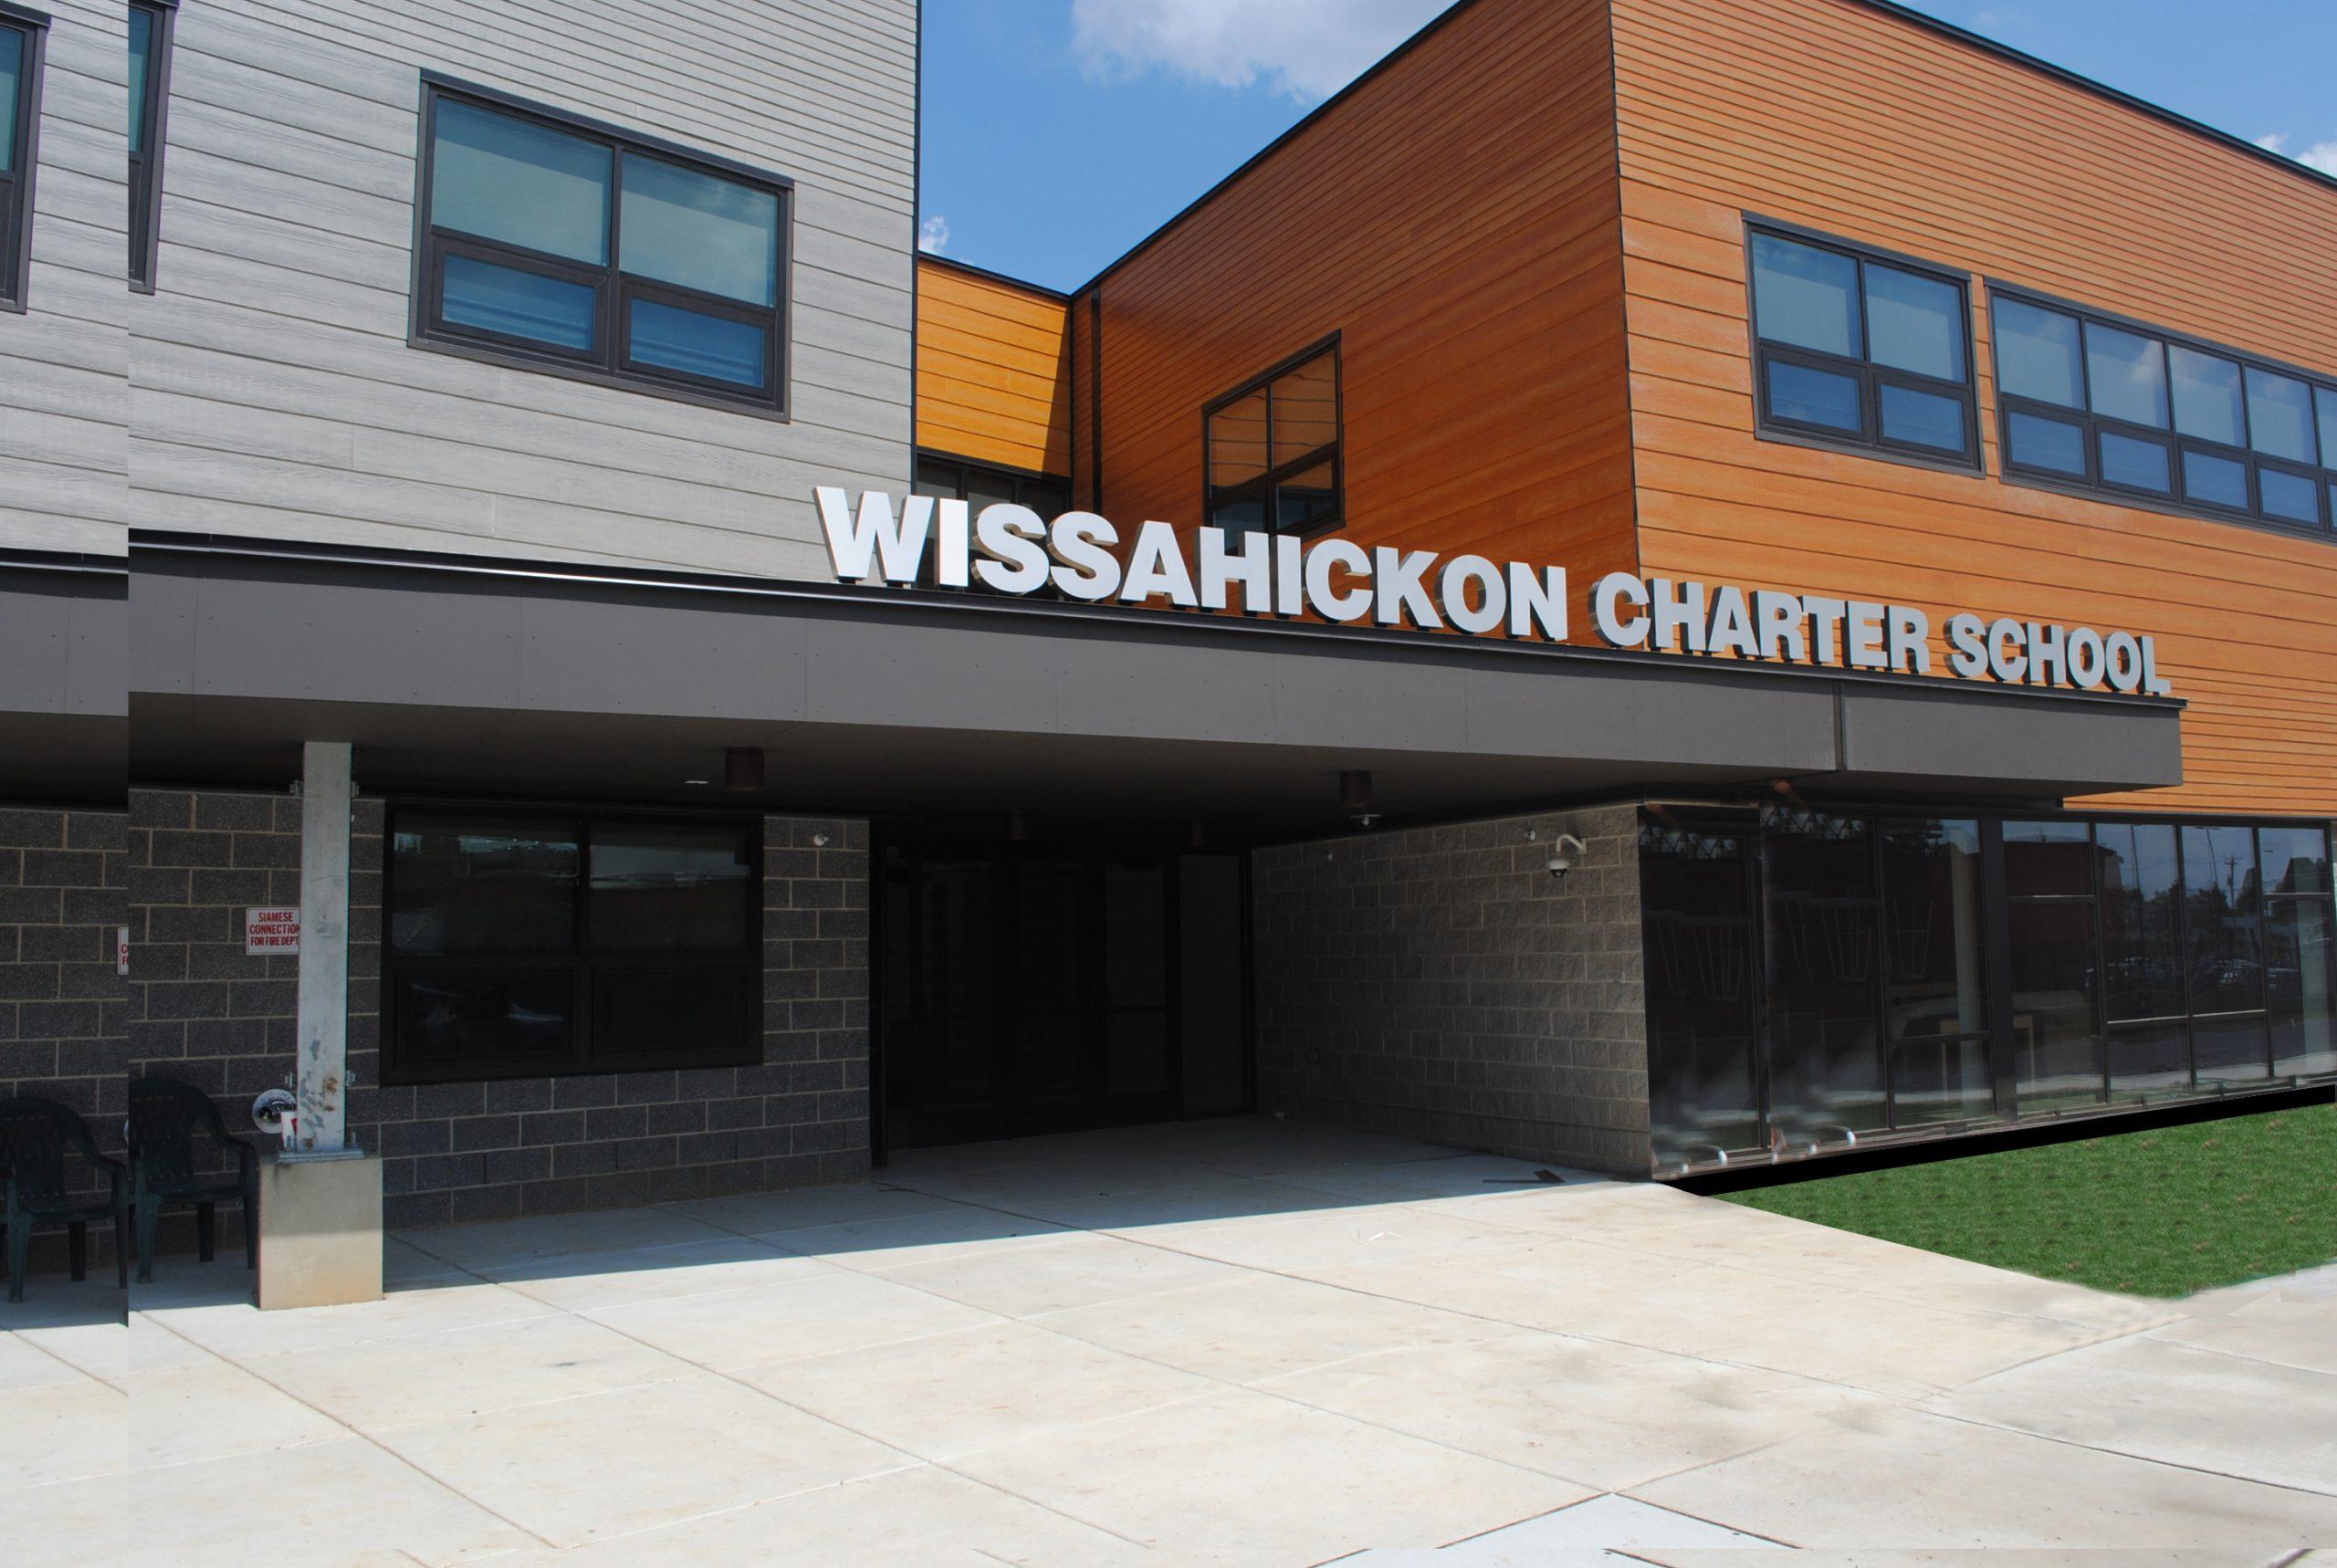 Wissahickon Charter School